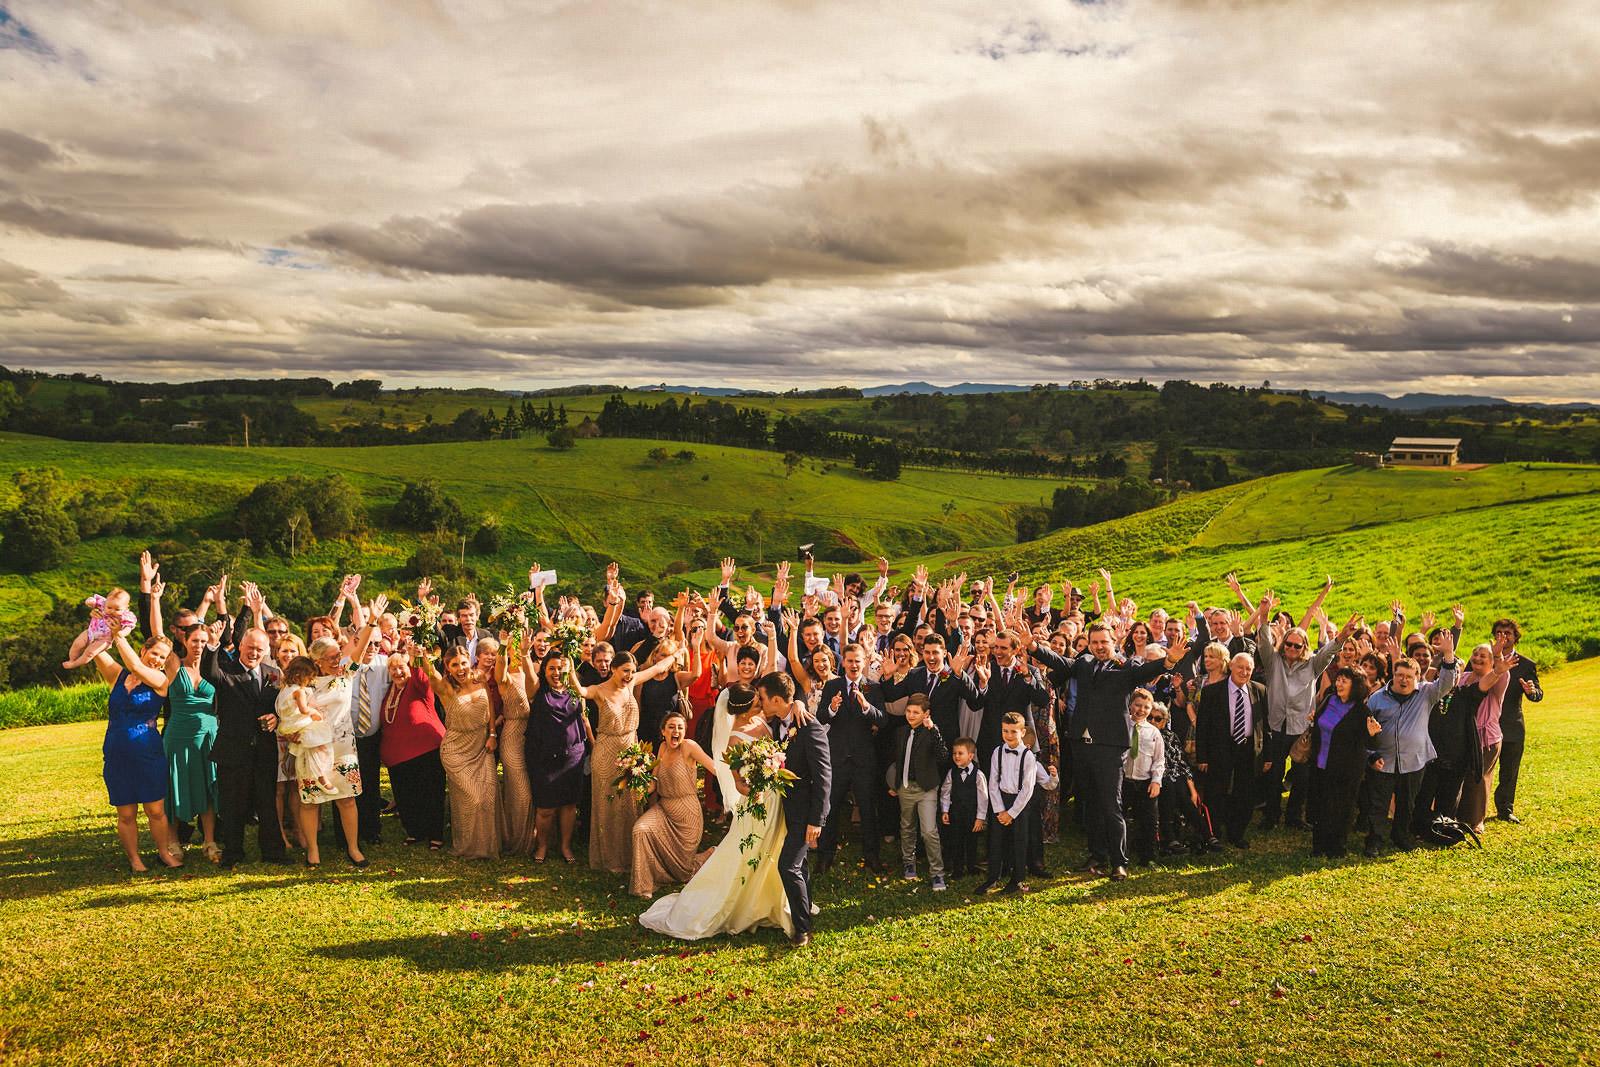 tablelands_wedding_0025